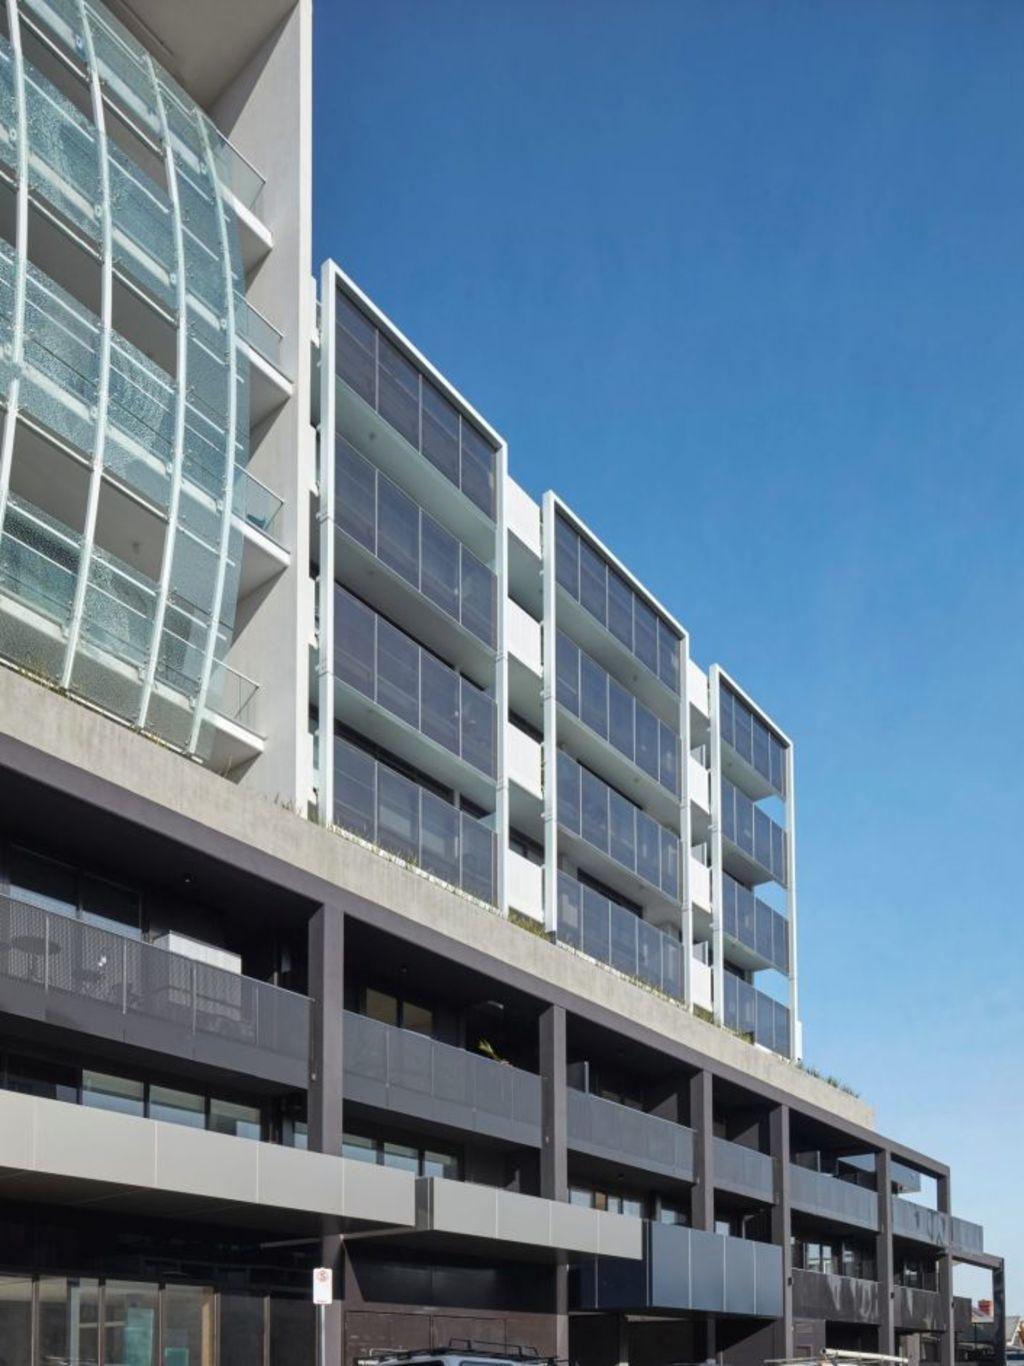 The General was built by Cedar Group developments. Photo: Peter Clarke